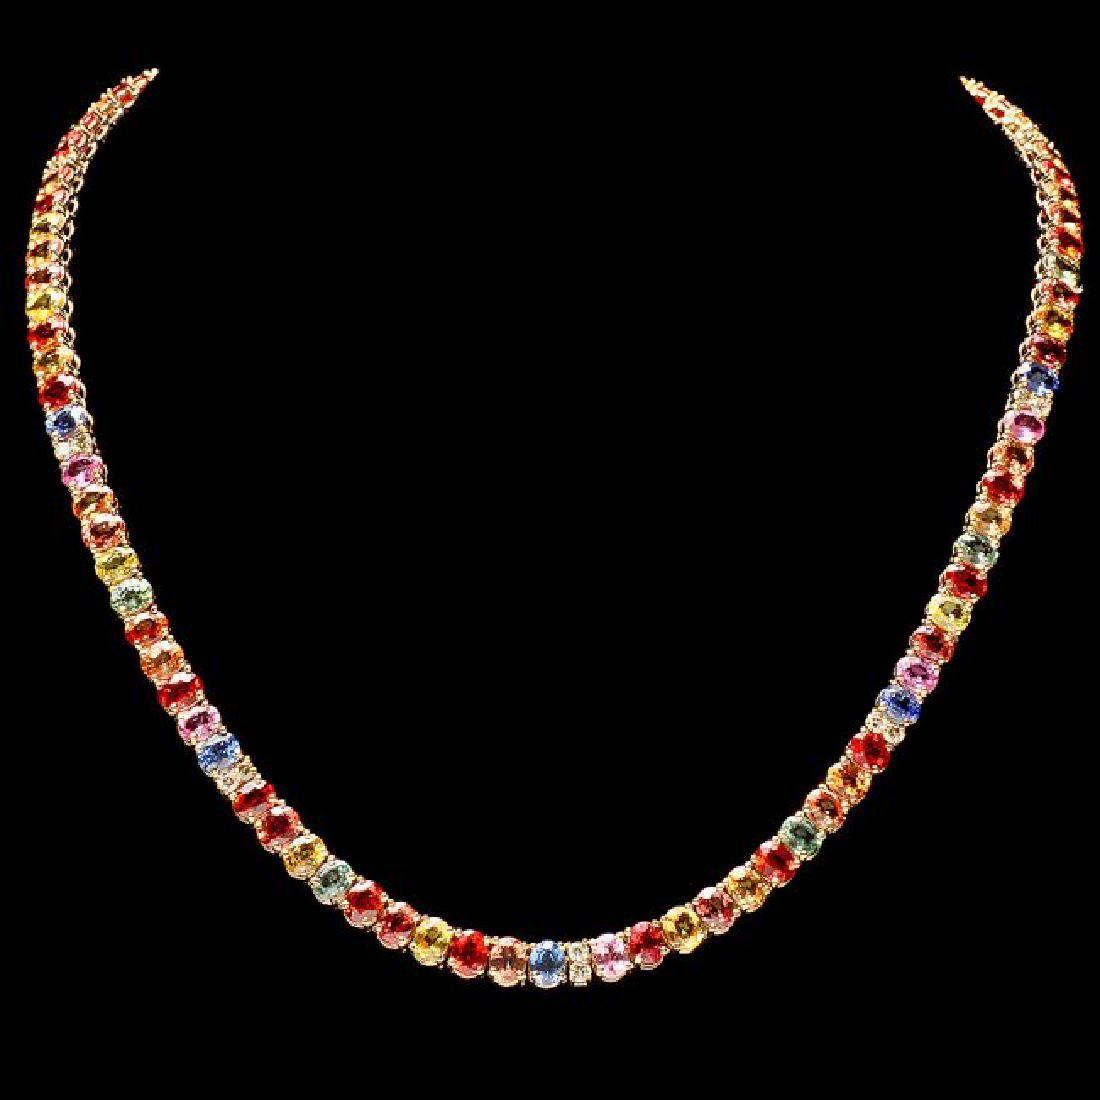 14k Gold 44ct Sapphire 1.0ct Diamond Necklace